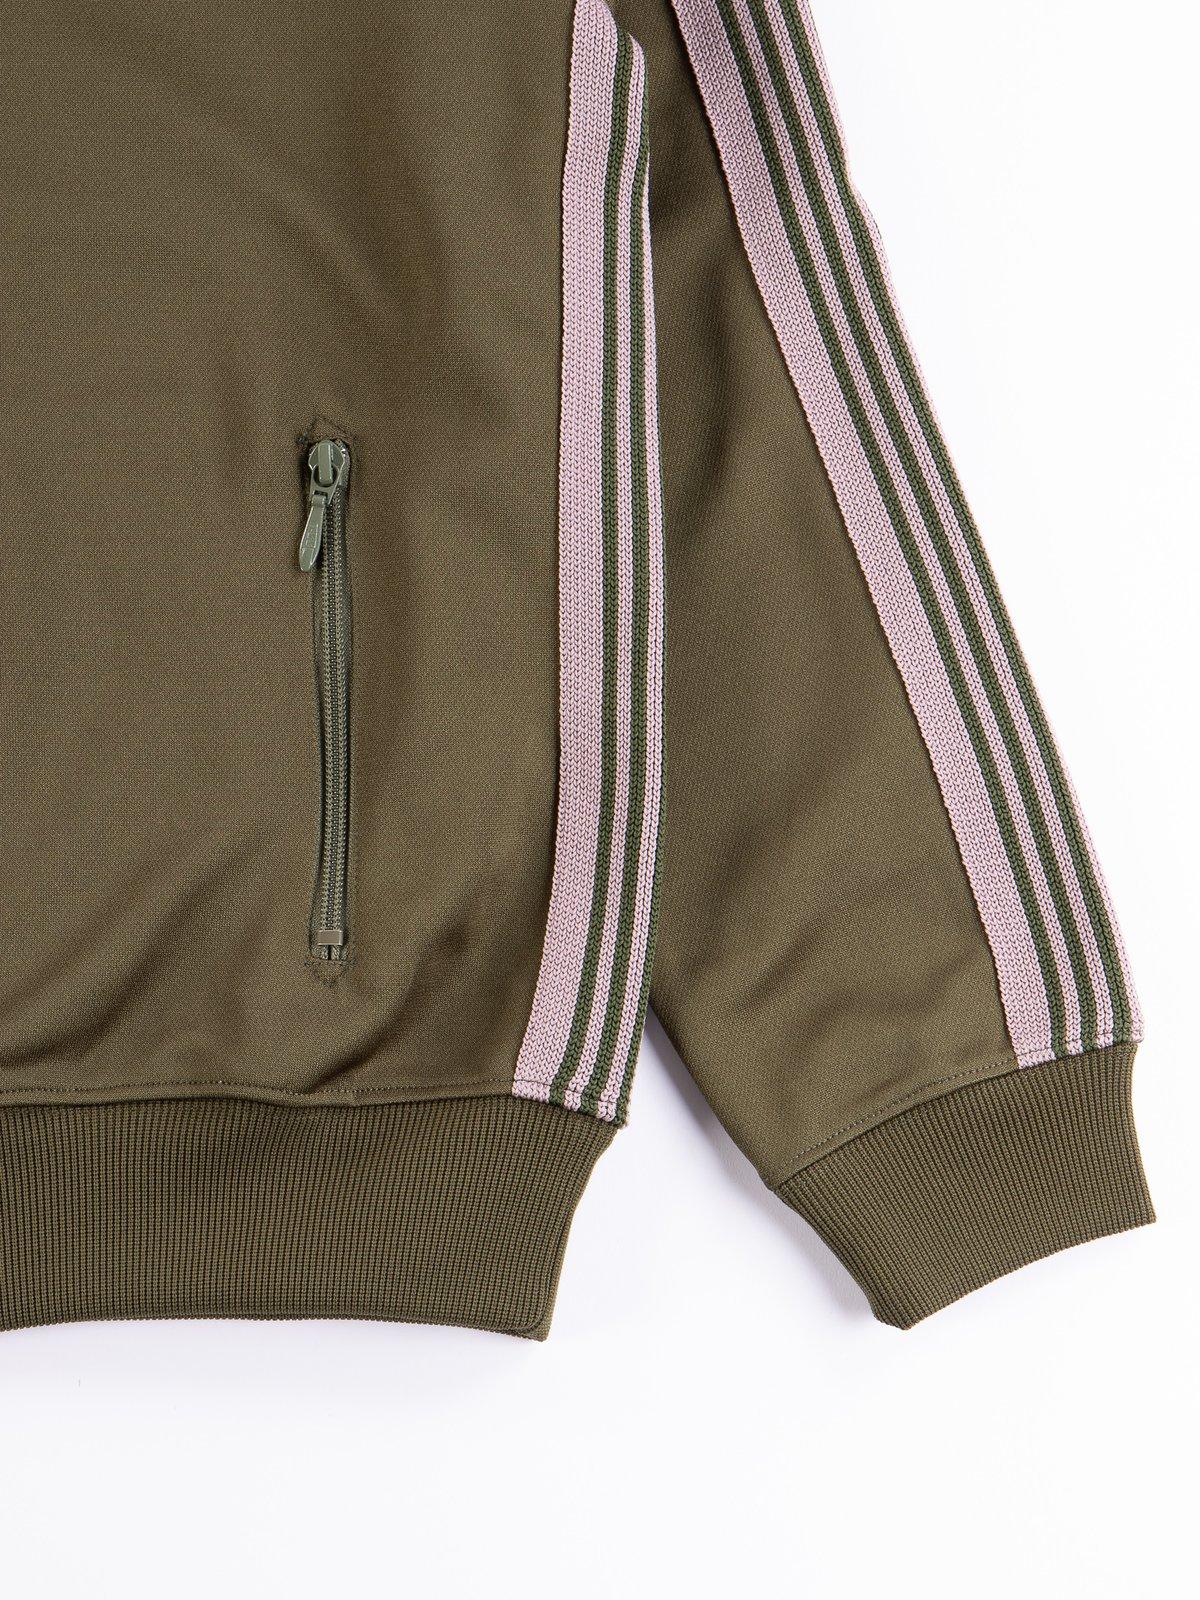 Olive Track Jacket - Image 5